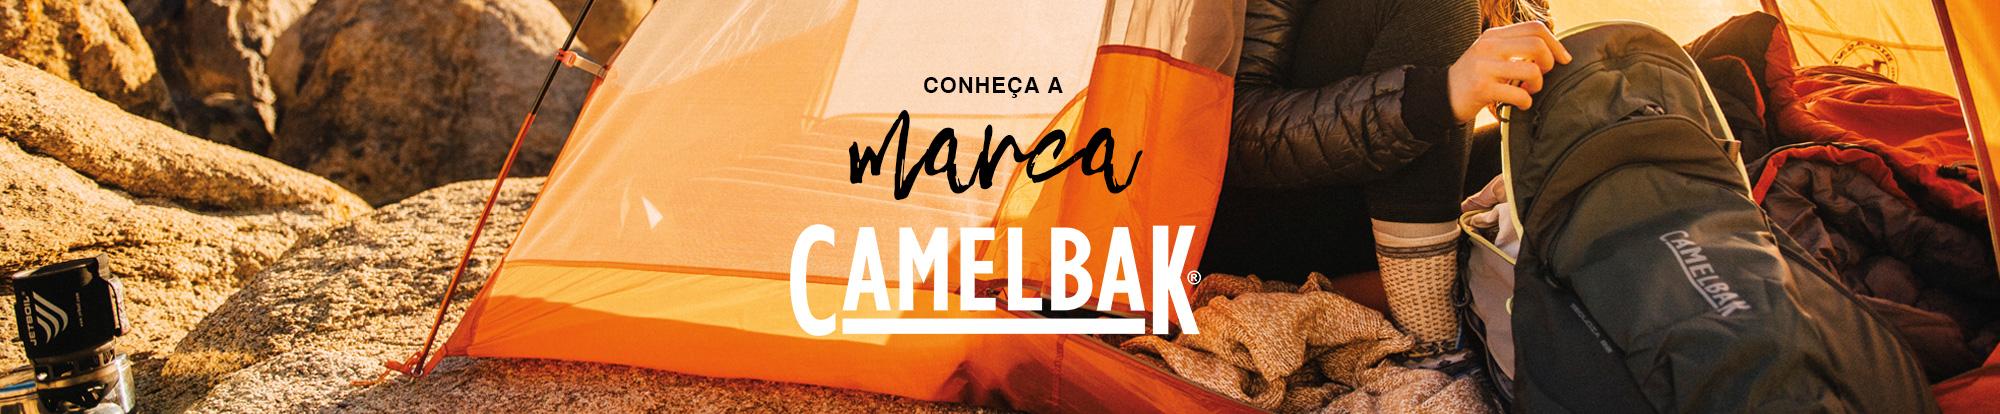 Banner Camelbak